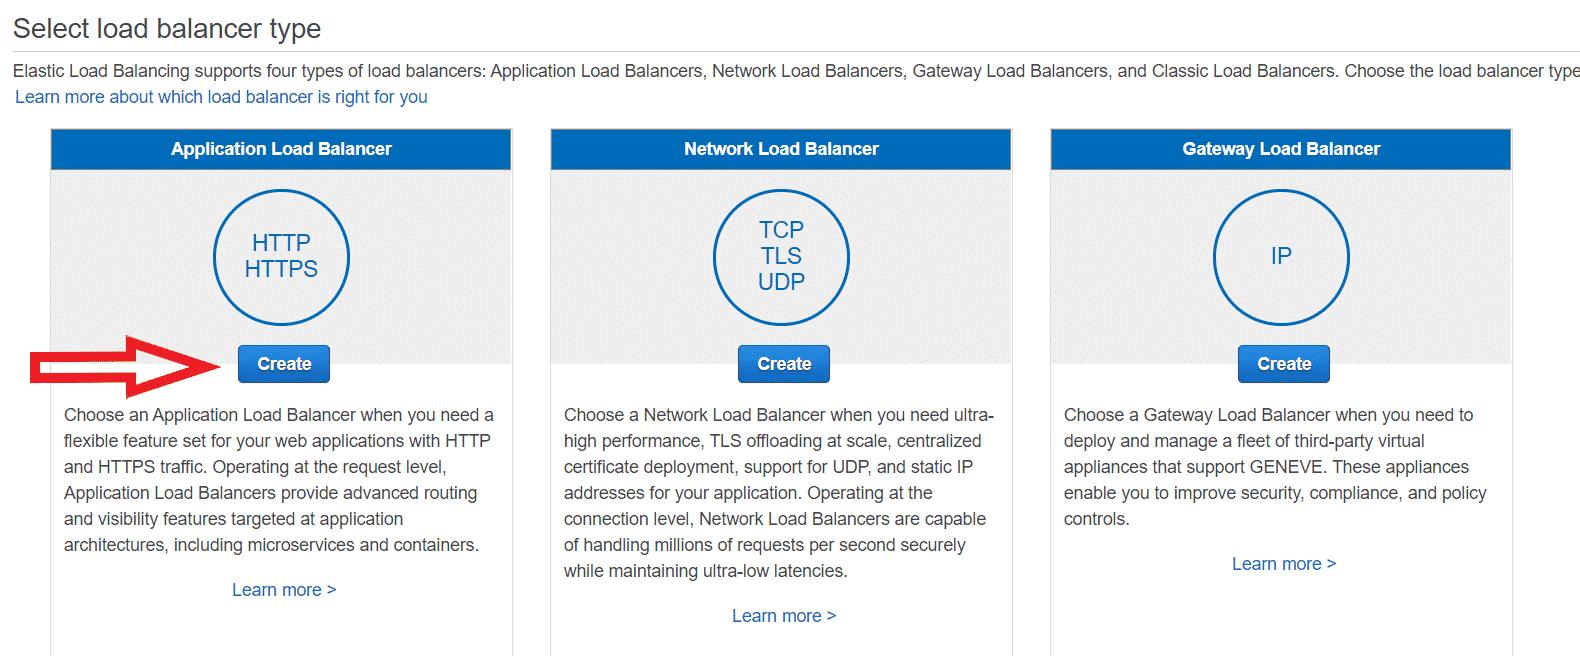 Application Load Balancer (ALB)